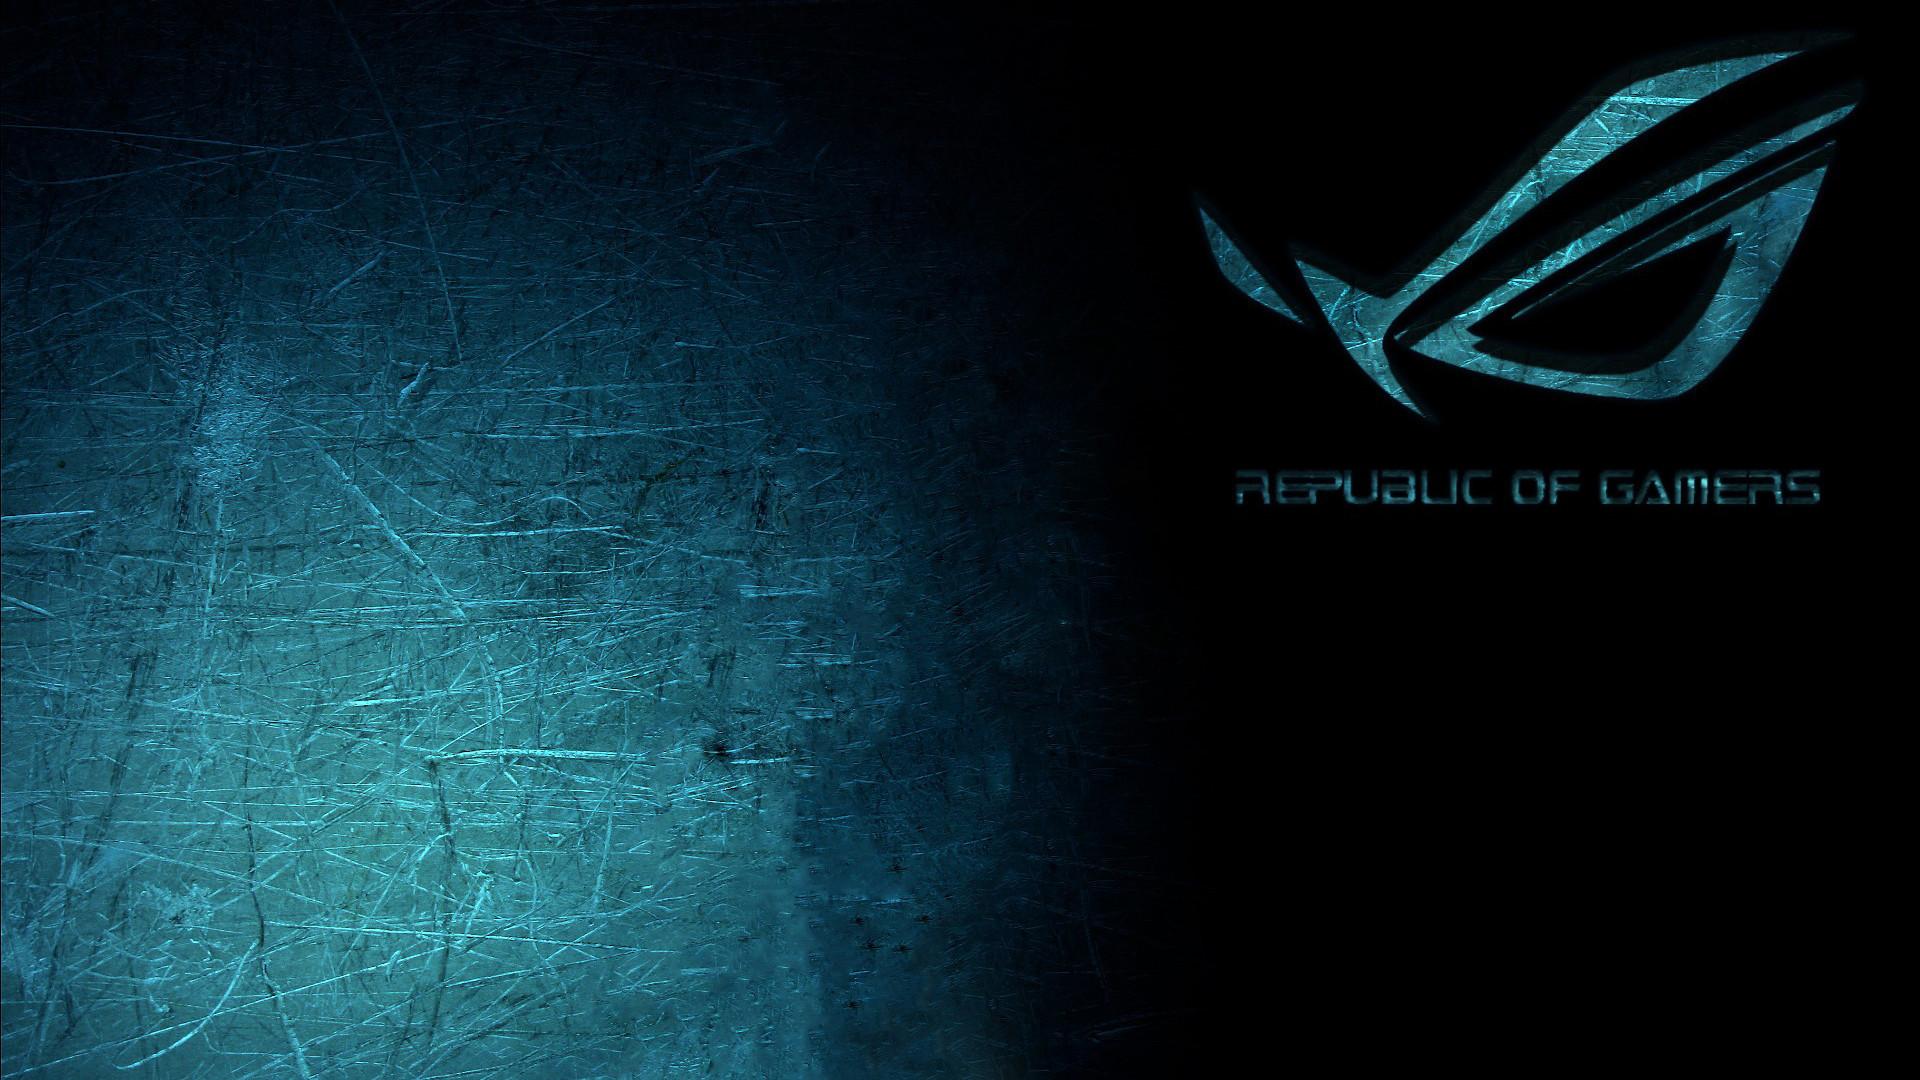 Gaming Asus ROG 4k desktop background wallpapers